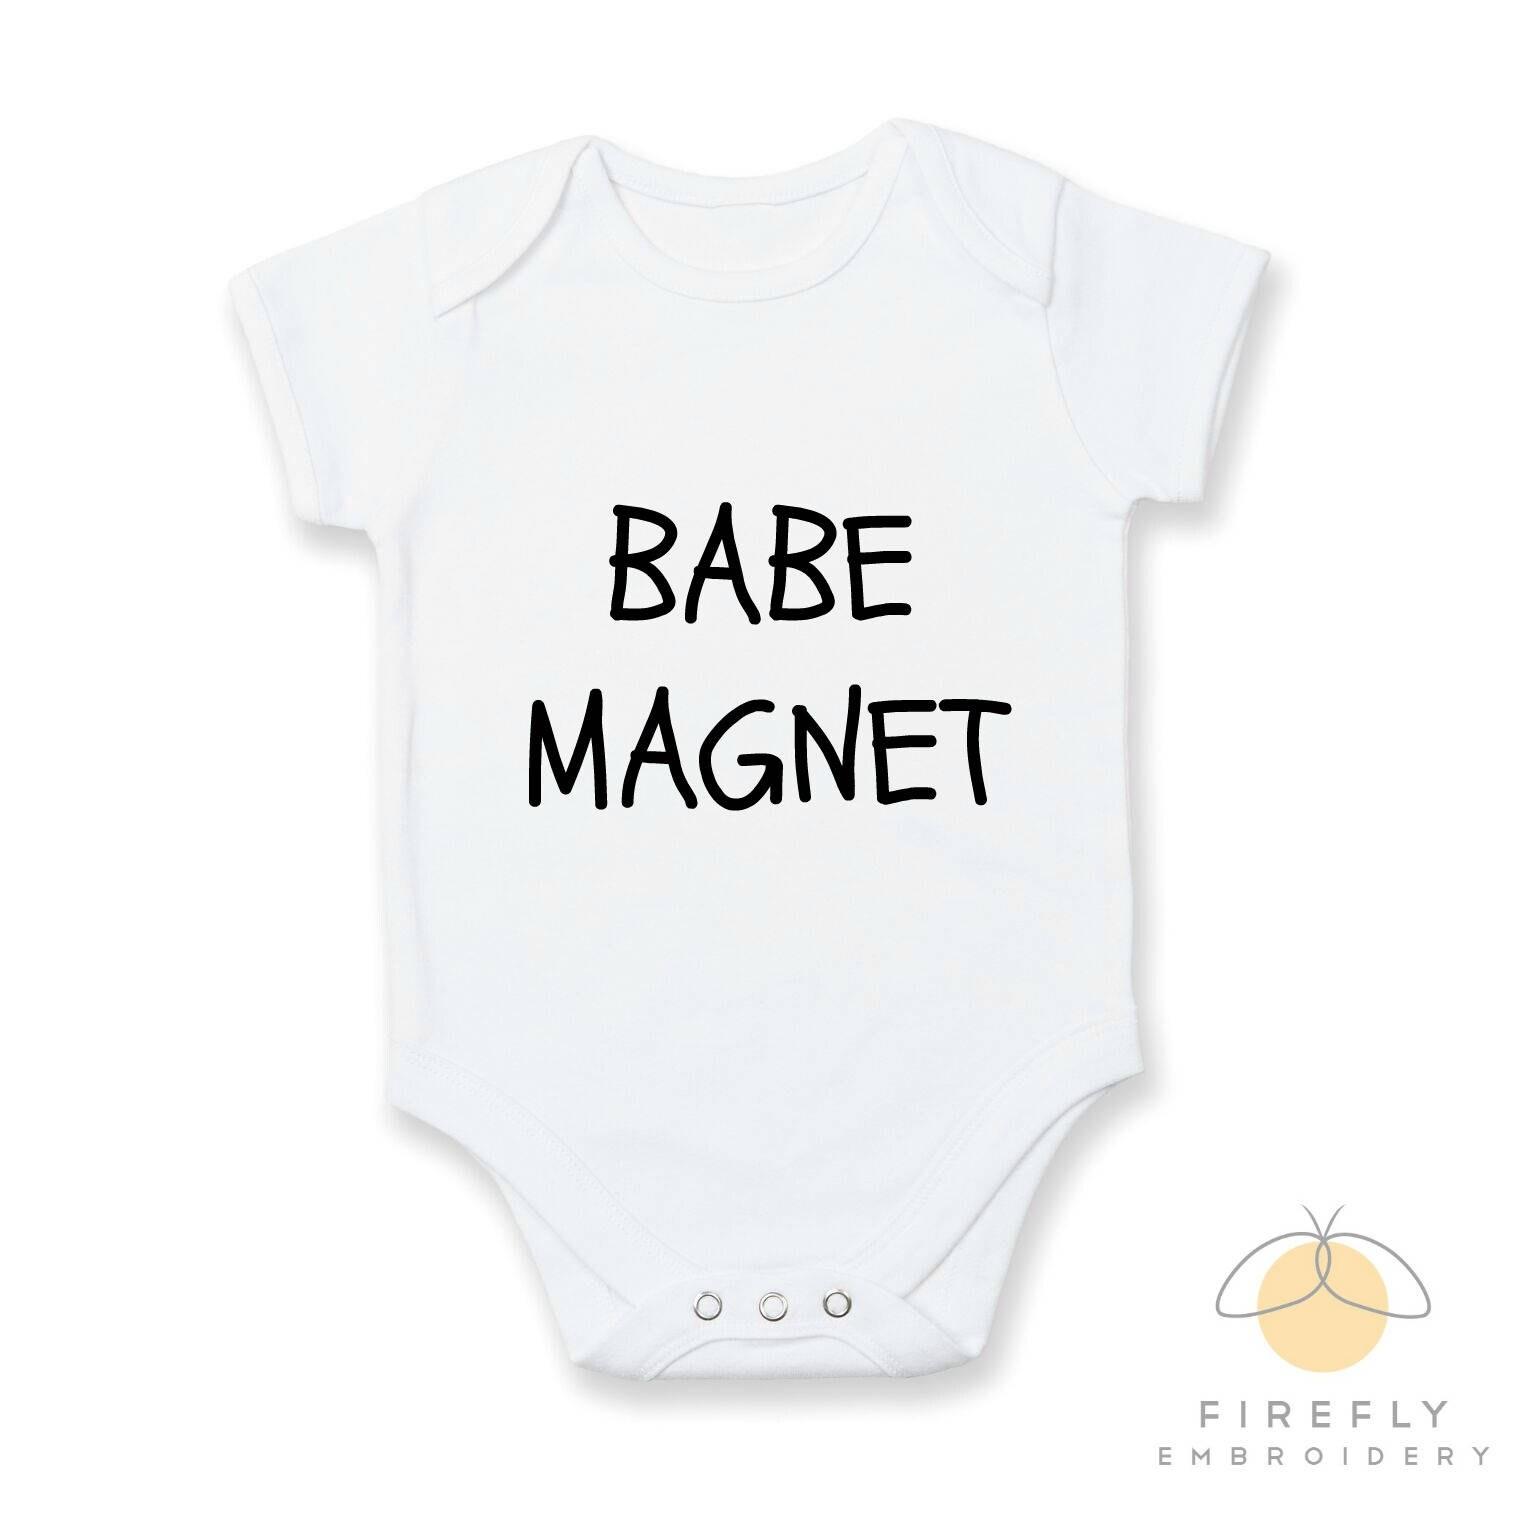 Babe Magnet Baby Vest